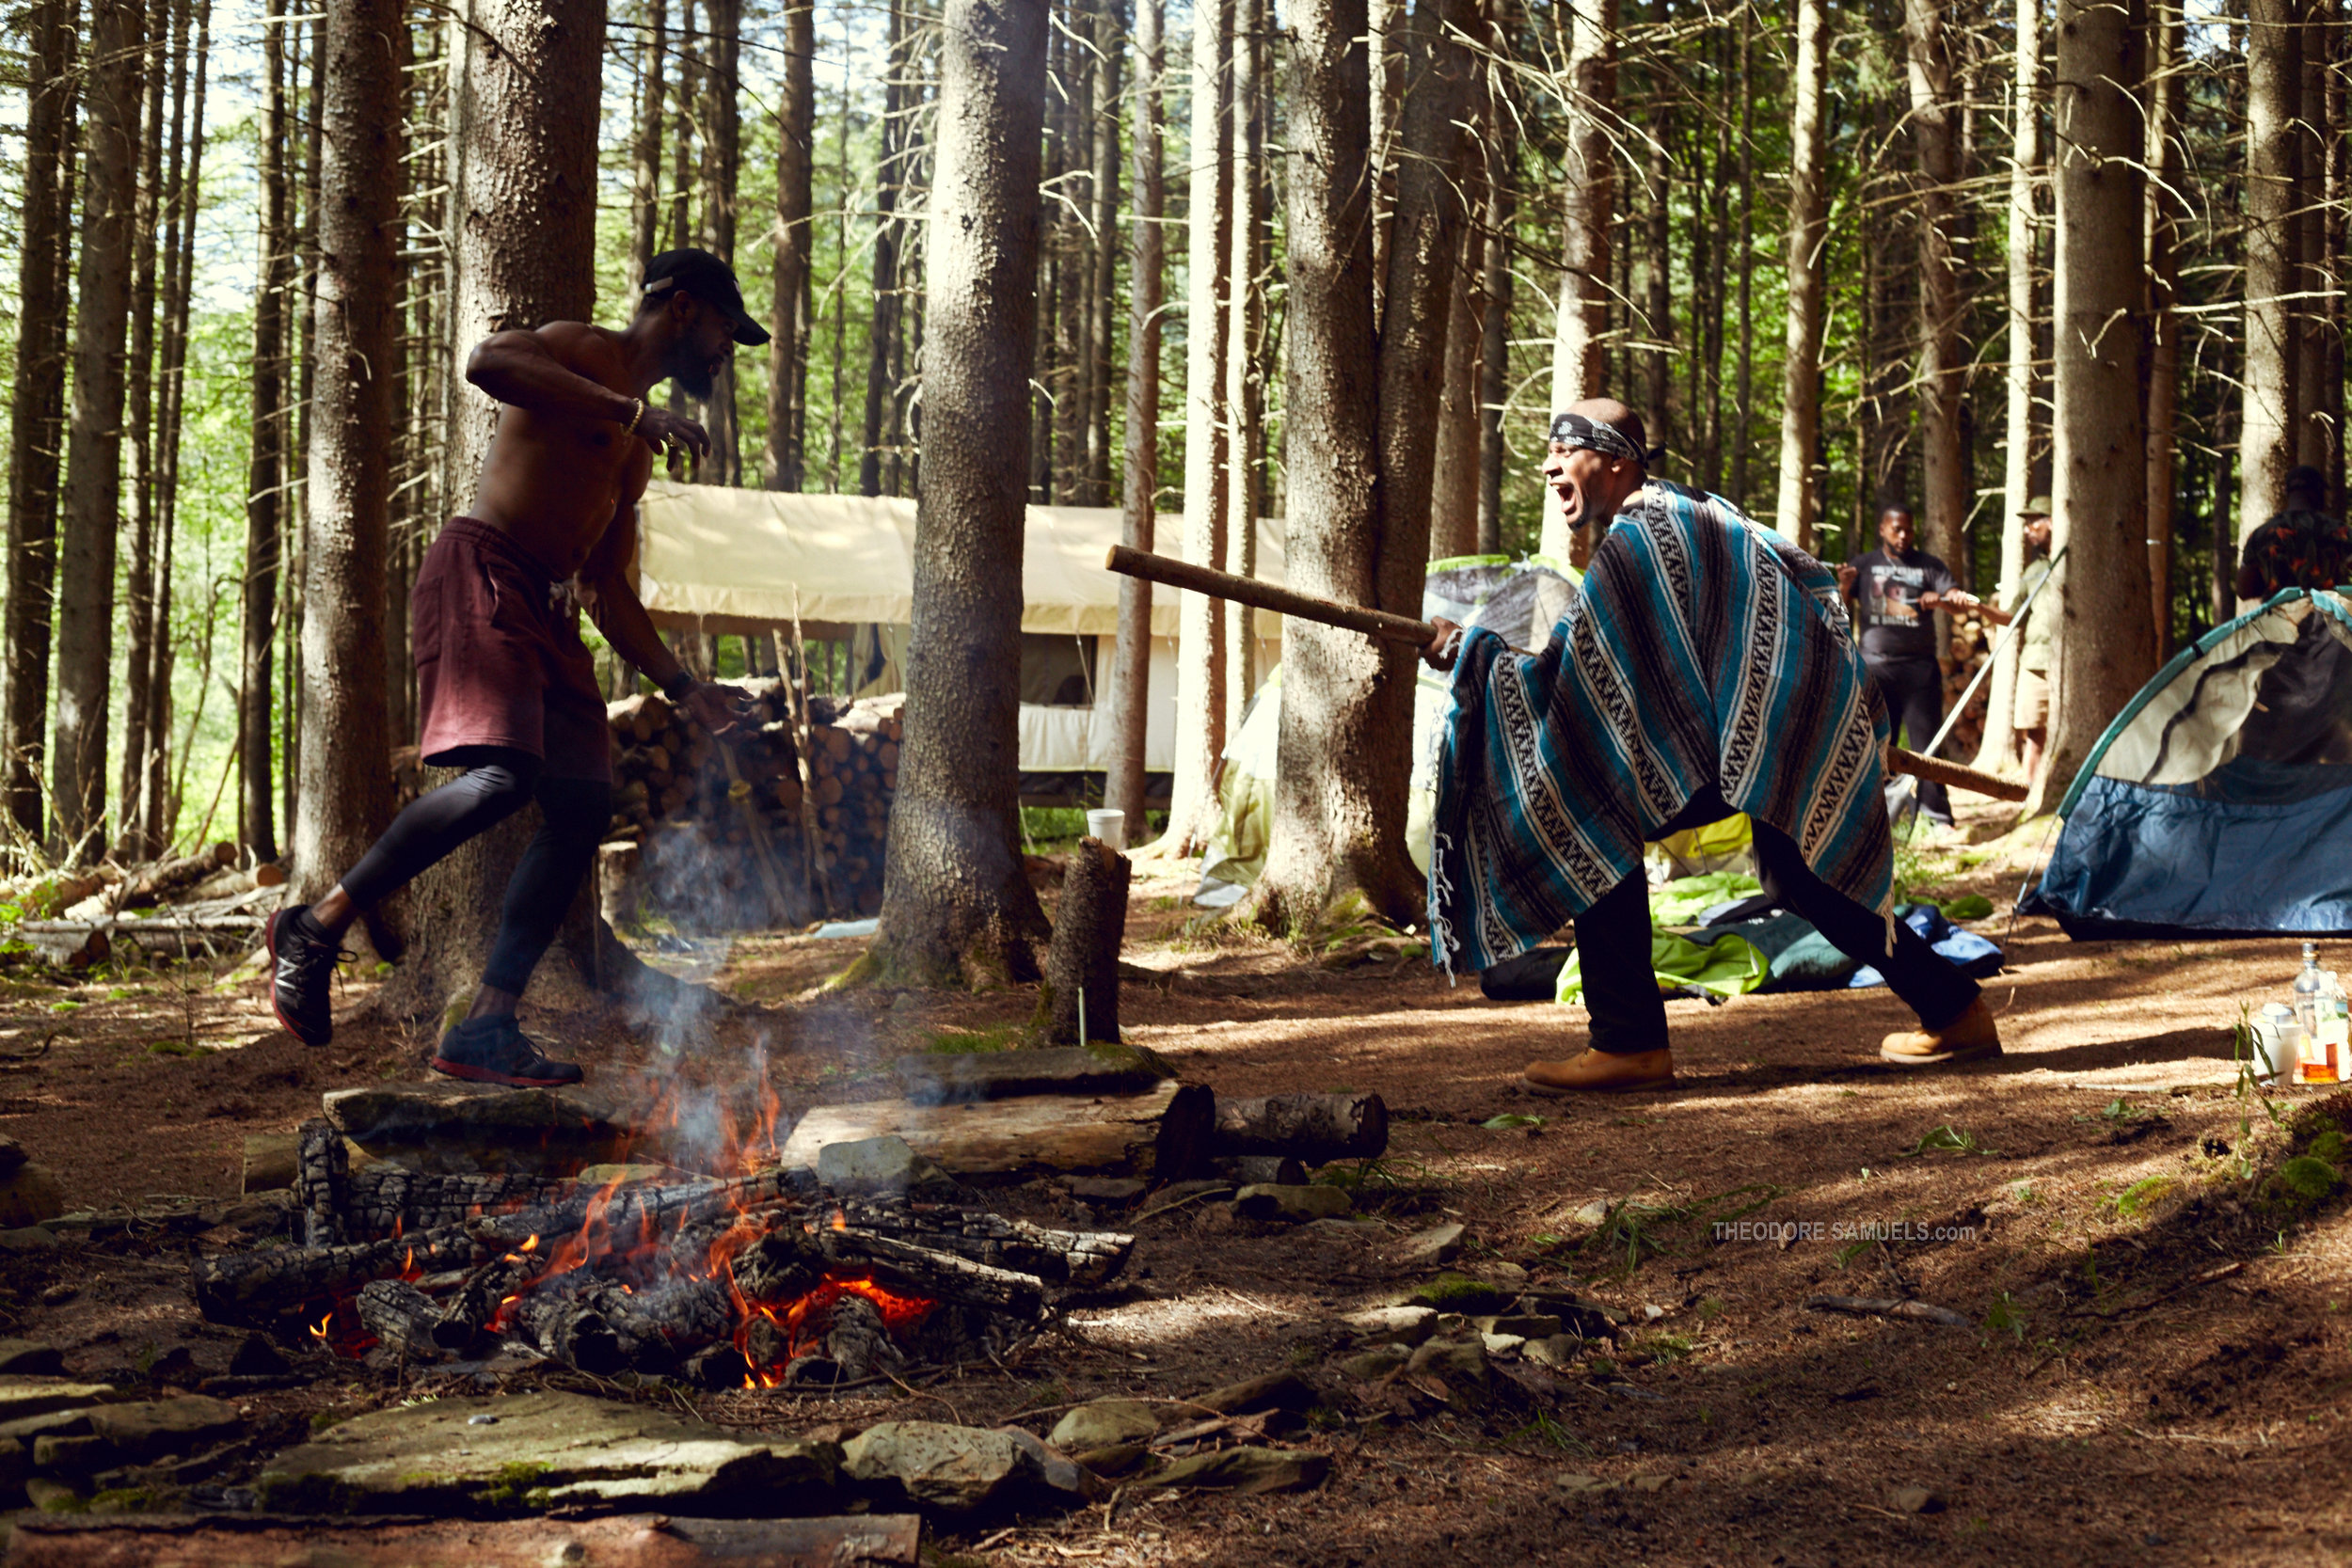 170625_Mastermind Camping_023.jpg